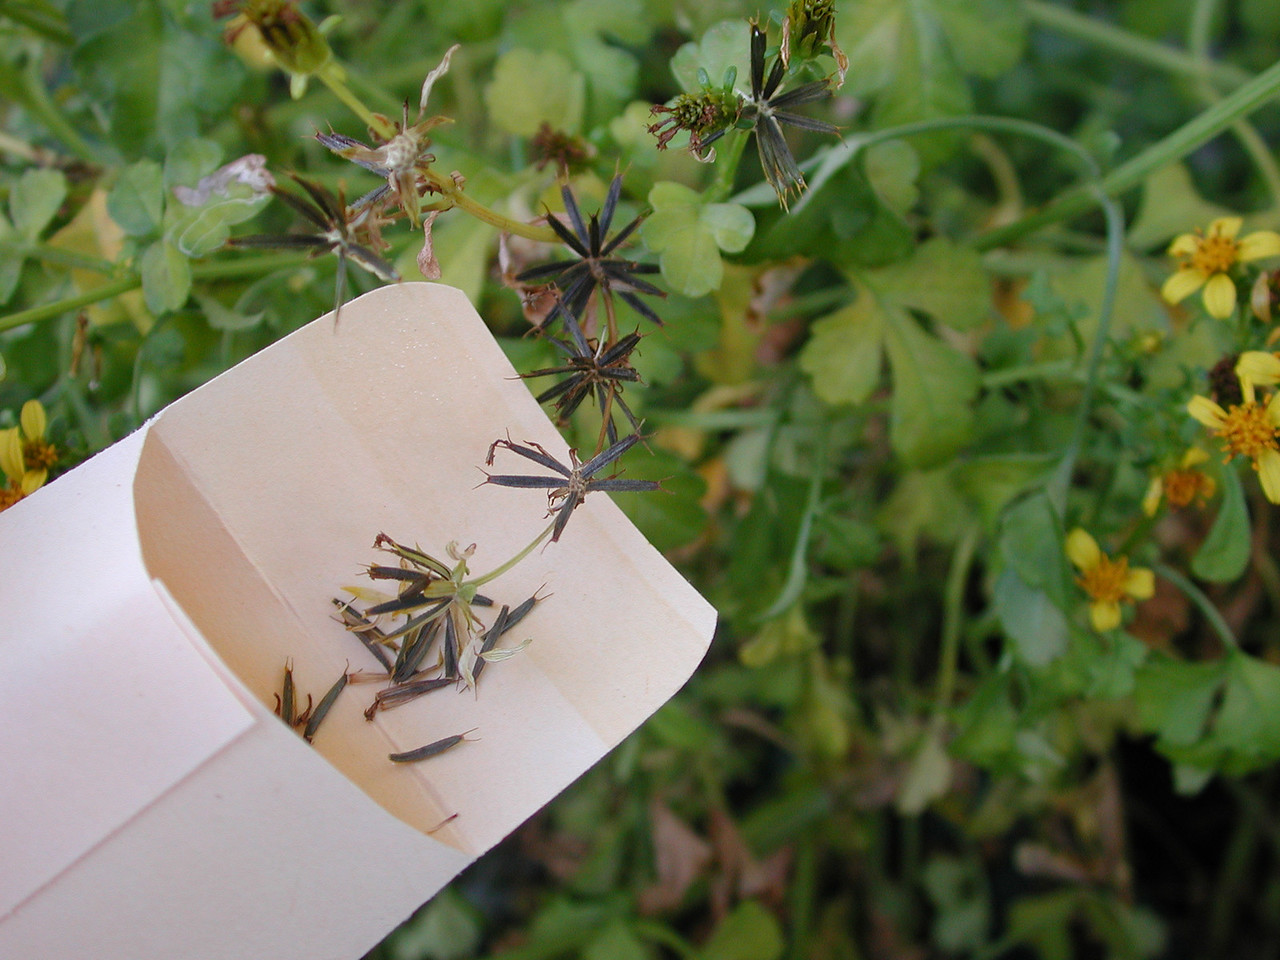 Bidens hillebrandiana subsp. polycephala